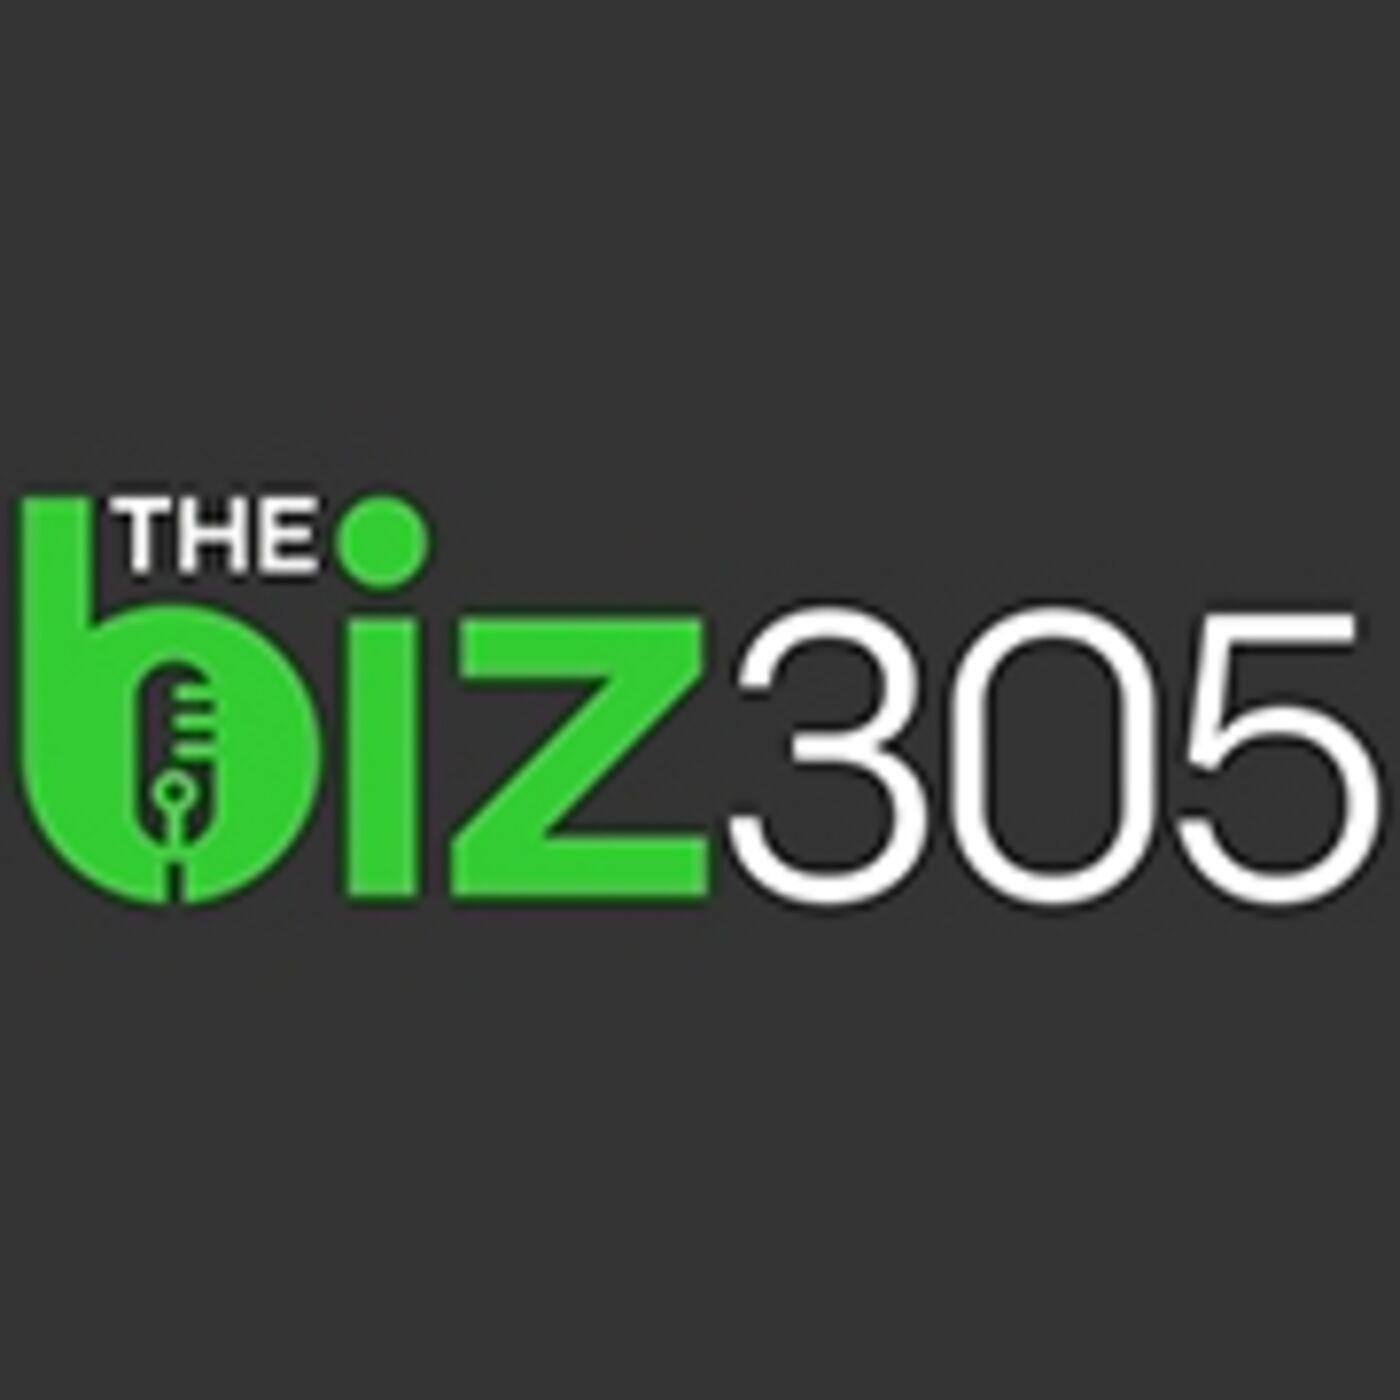 BIZ 305 features RME Credit Repair - Lynnslie Hunt   Whilly Bermudez